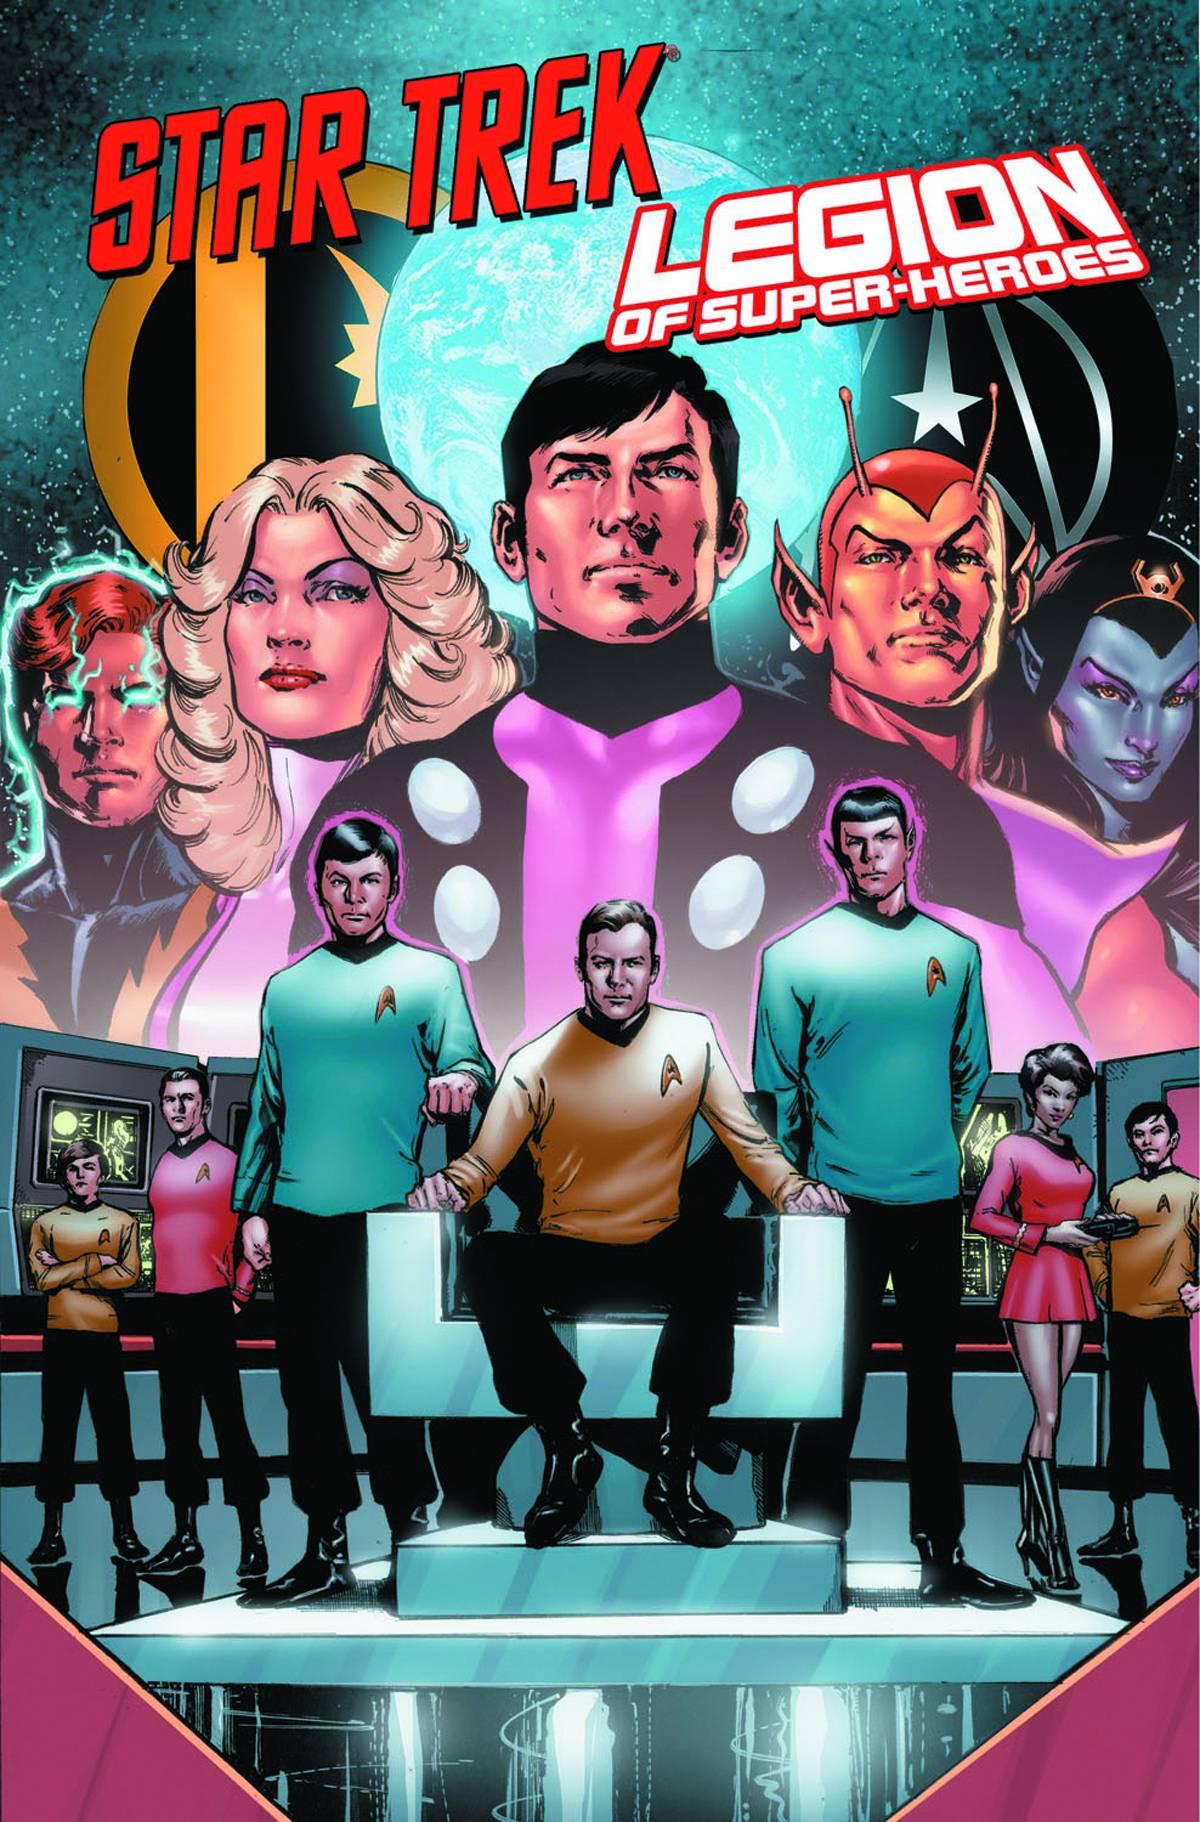 Star Trek Legion of Superheroes TP